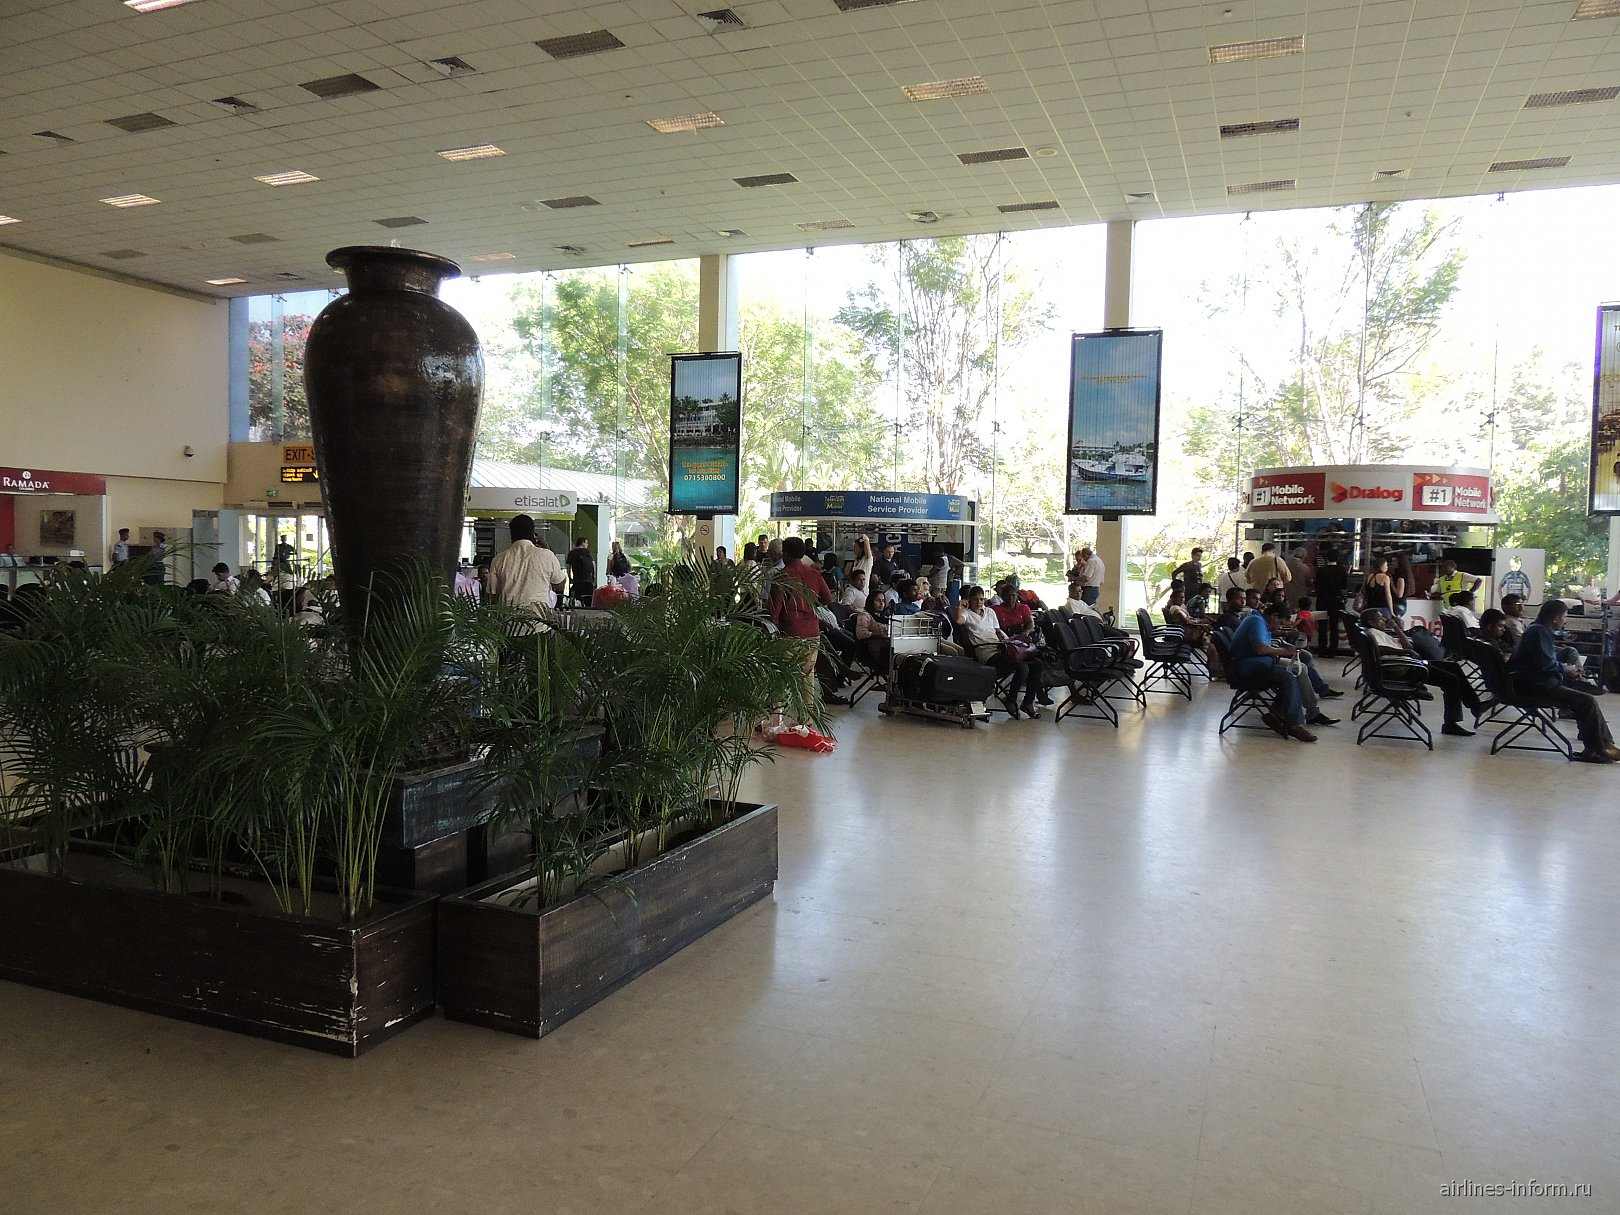 Зал прилета в аэропорту Коломбо Бандаранайке